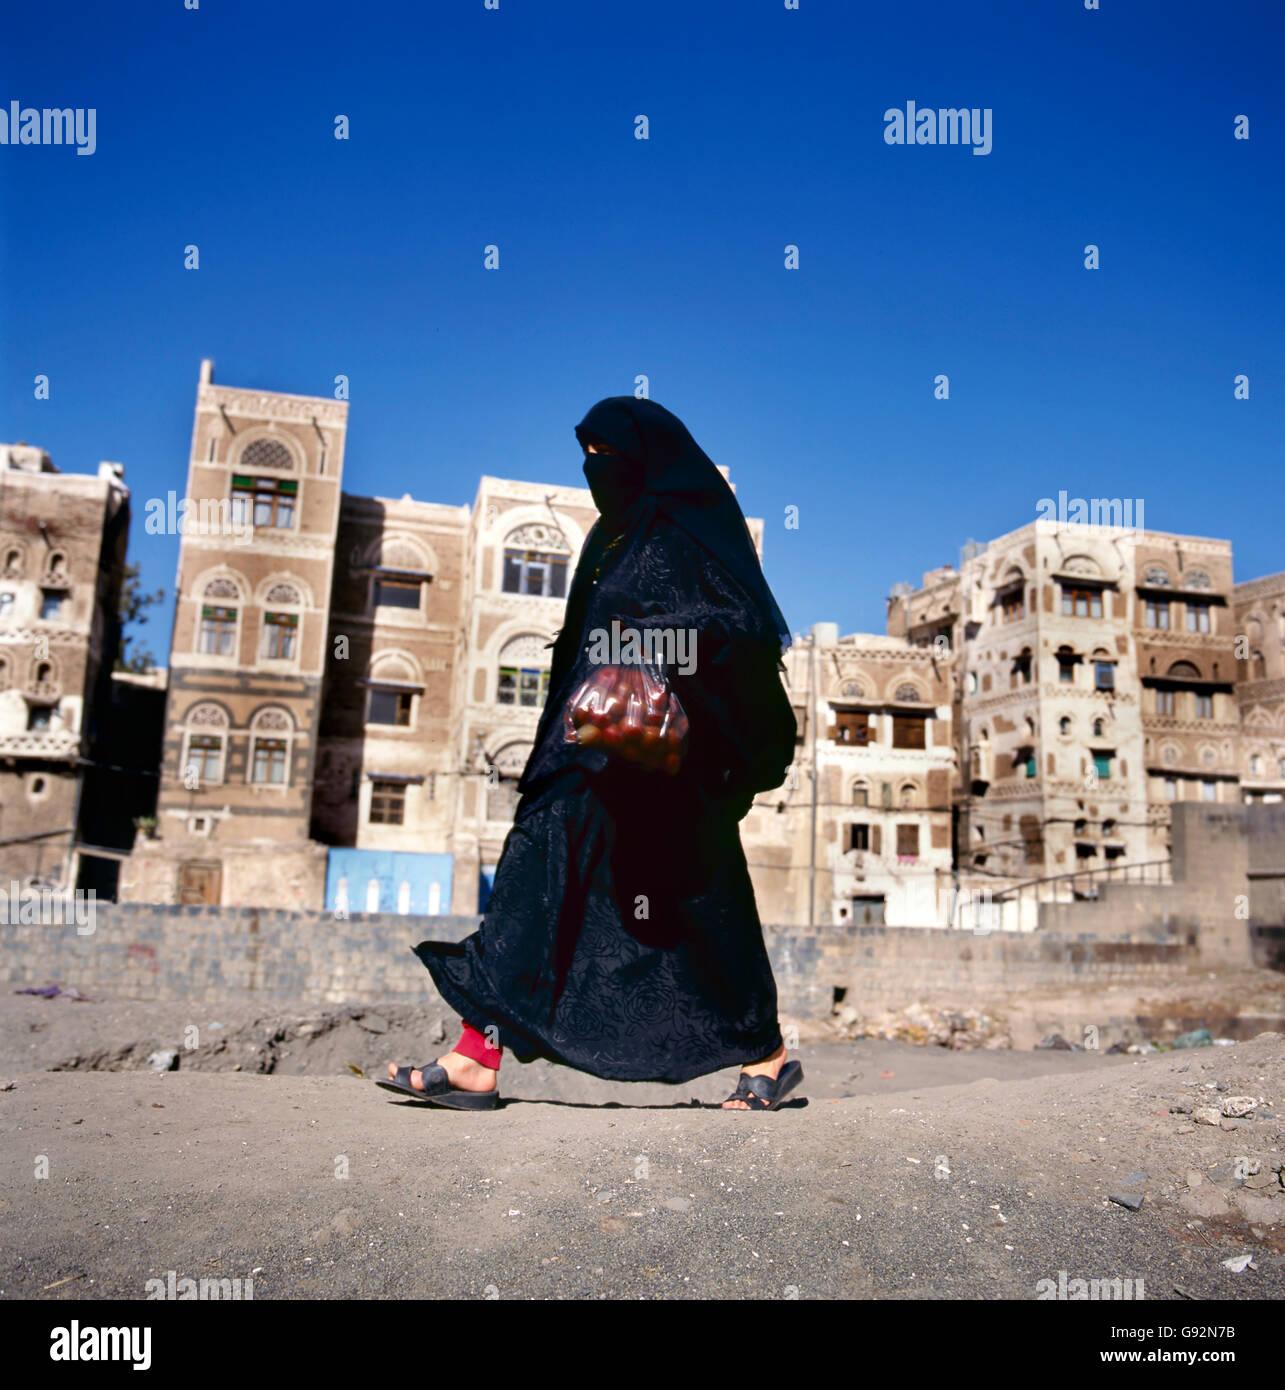 Veiled Muslim woman walks on  Sana'a street, Yemen. At background typical Yemen houses. Stock Photo